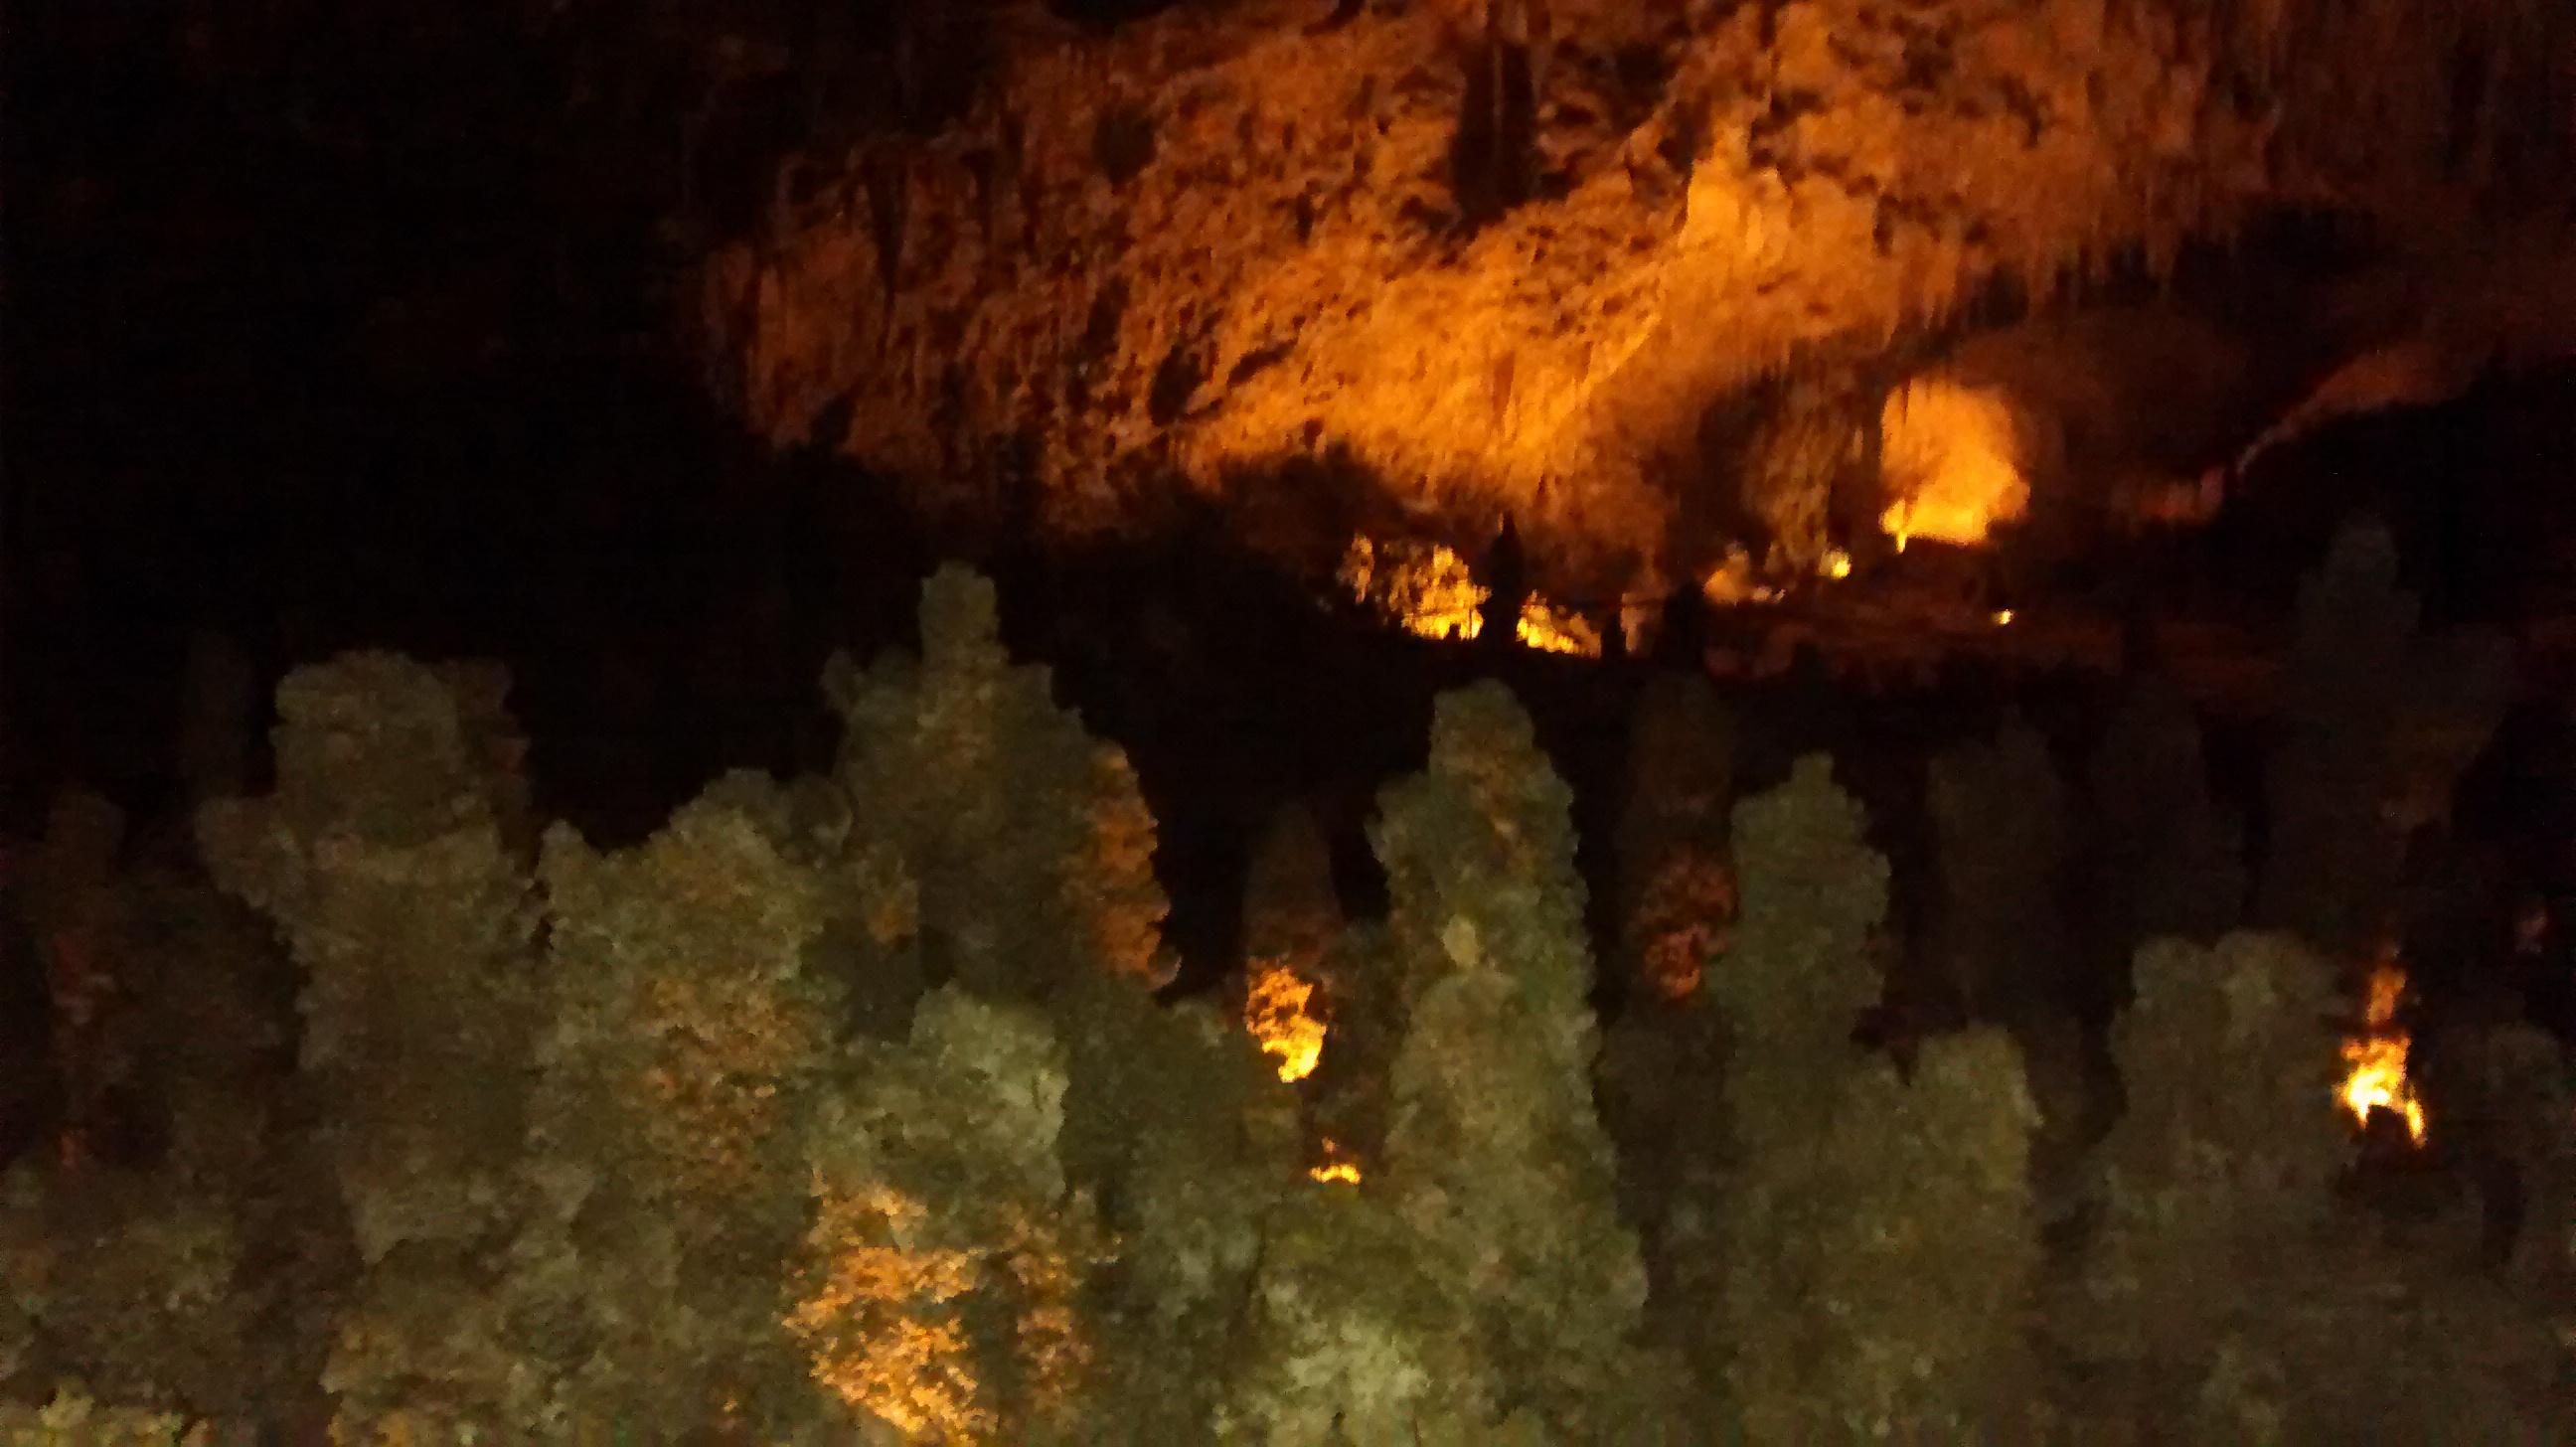 Tropfsteinhöhle in New Mexico Foto: Eva Saehsen